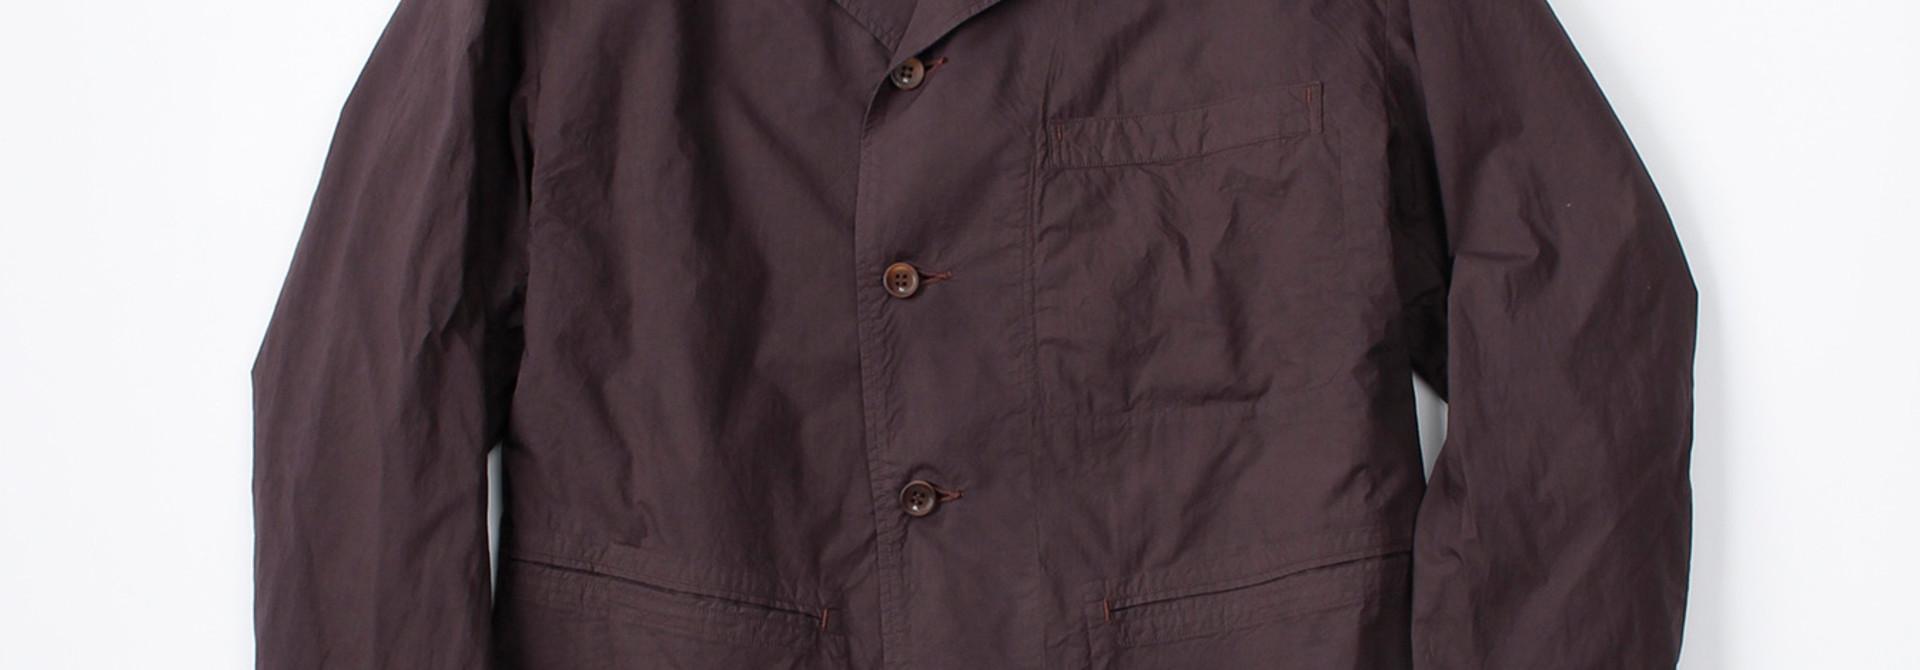 WH Sheet-cloth Jacket